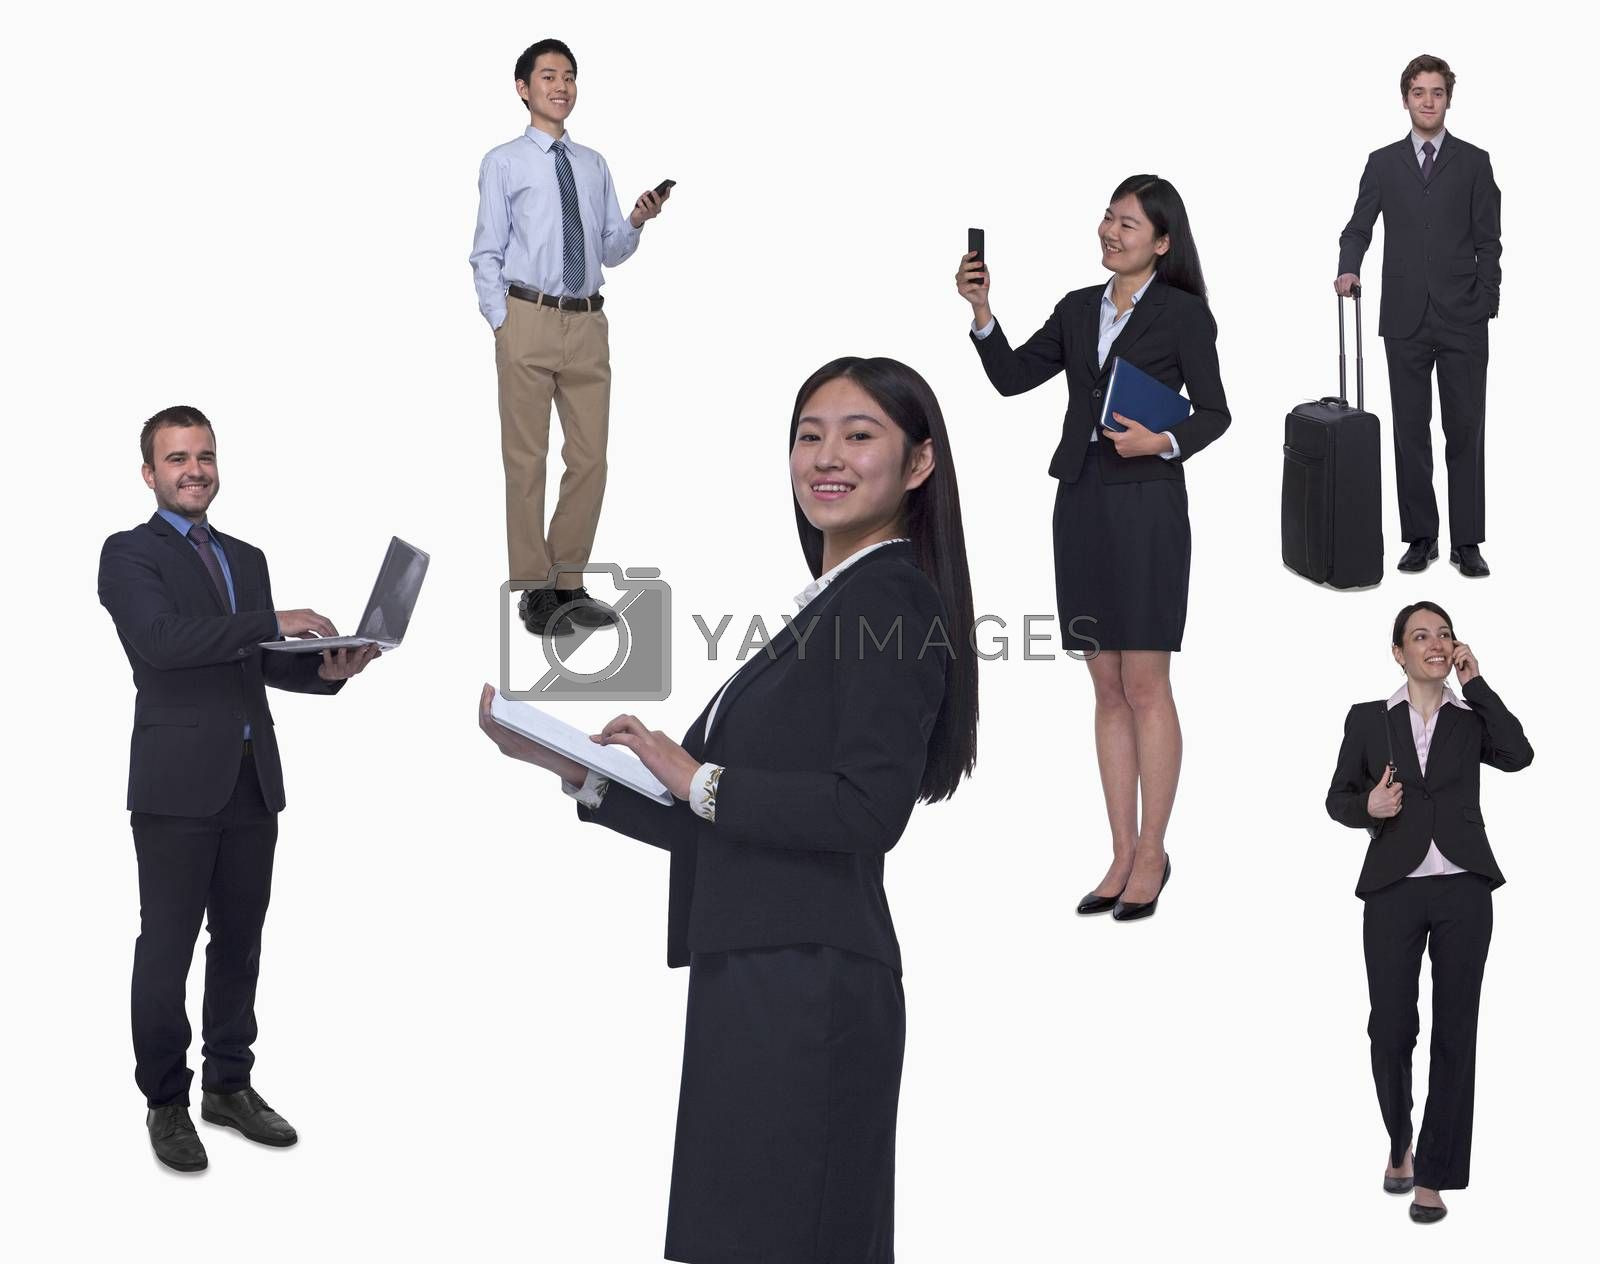 Group of business people working, talking on phone, walking, studio shot, full length